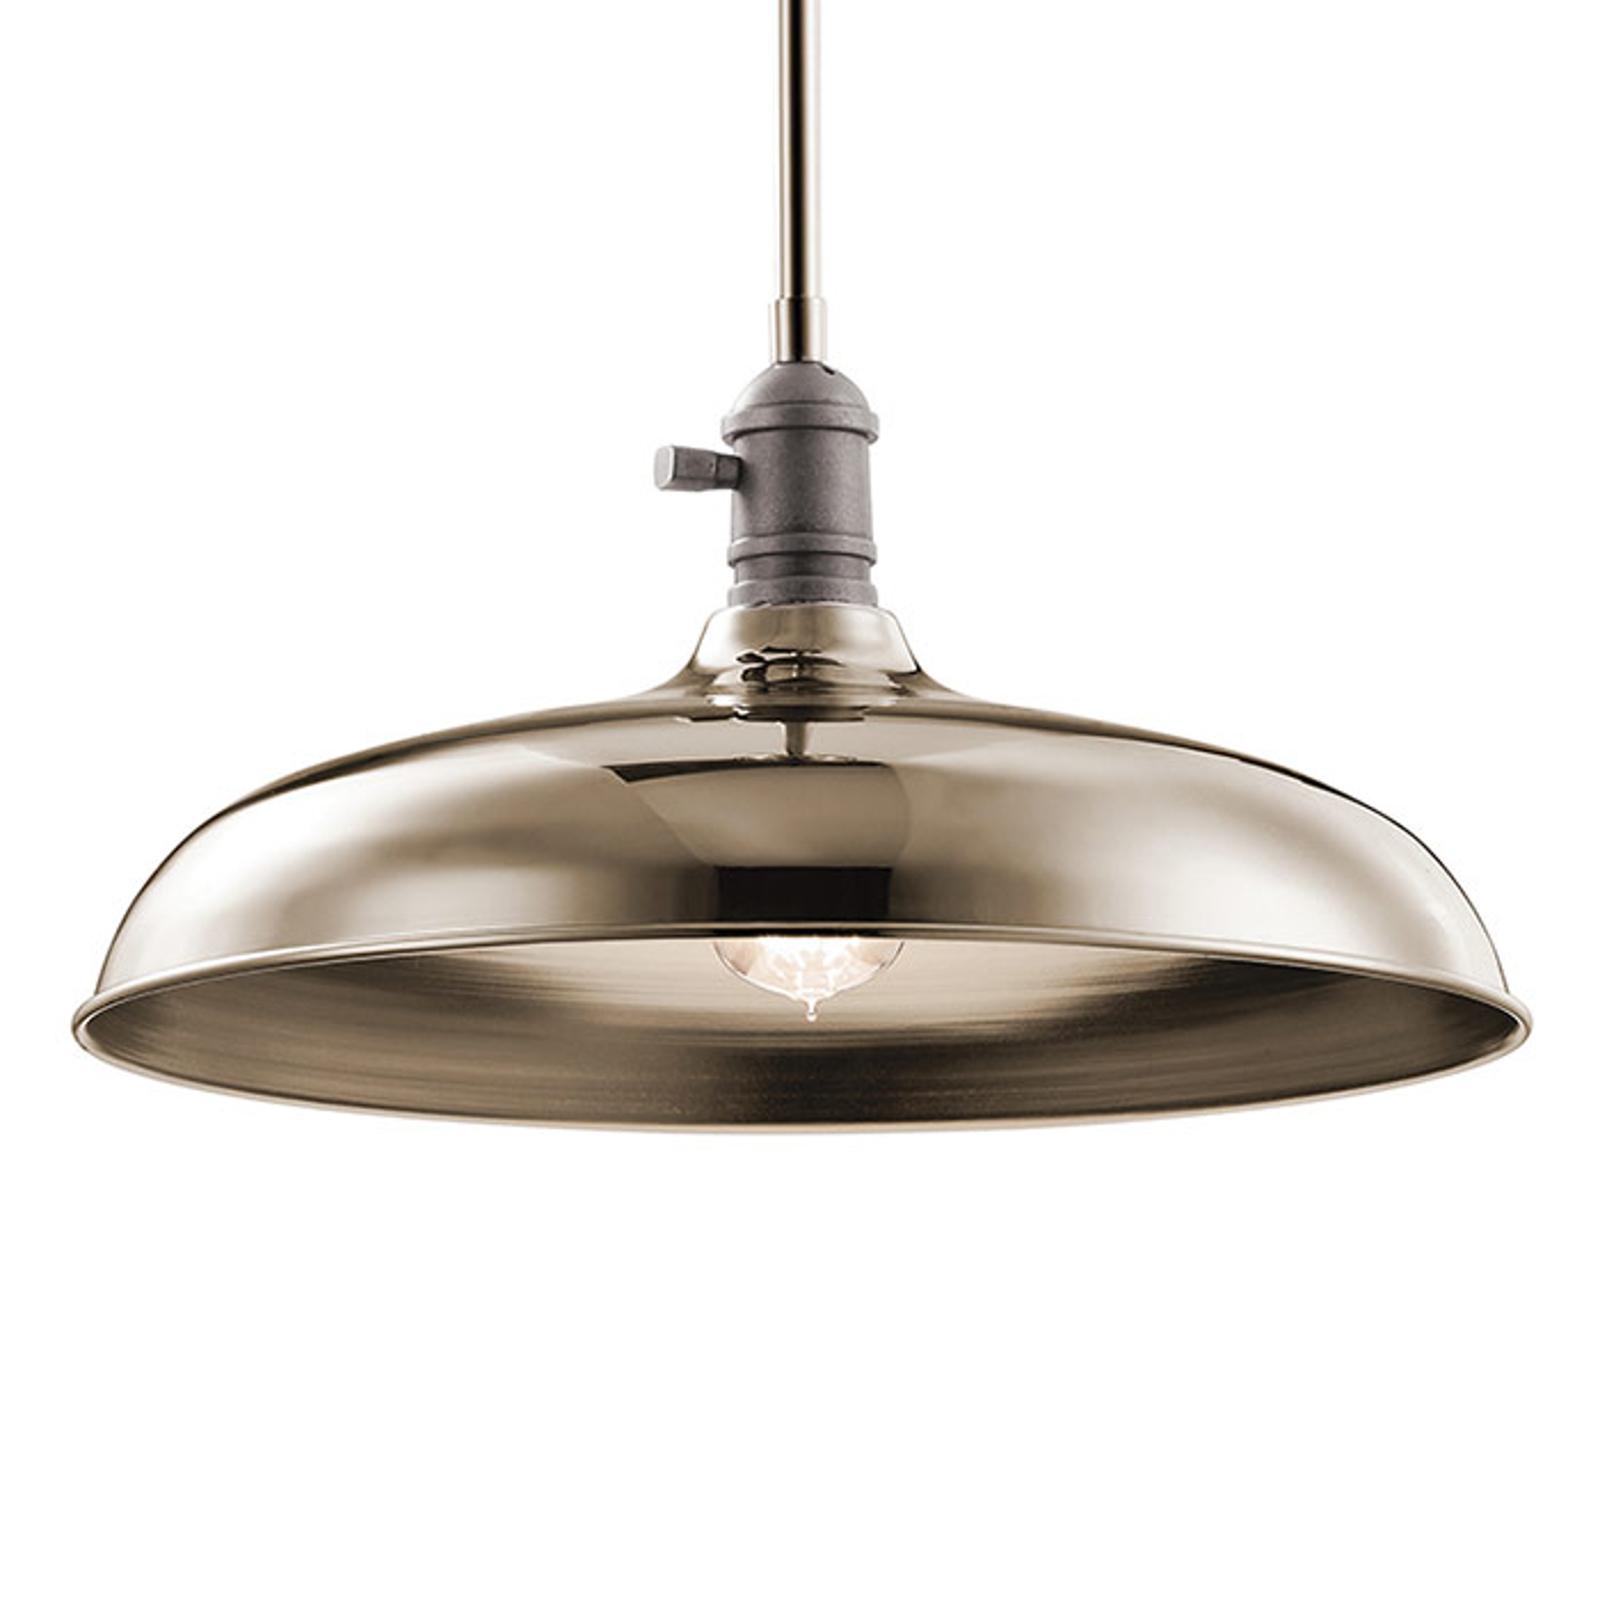 Hanglamp Cobson Ø 40,7 cm nikkel gepolijst